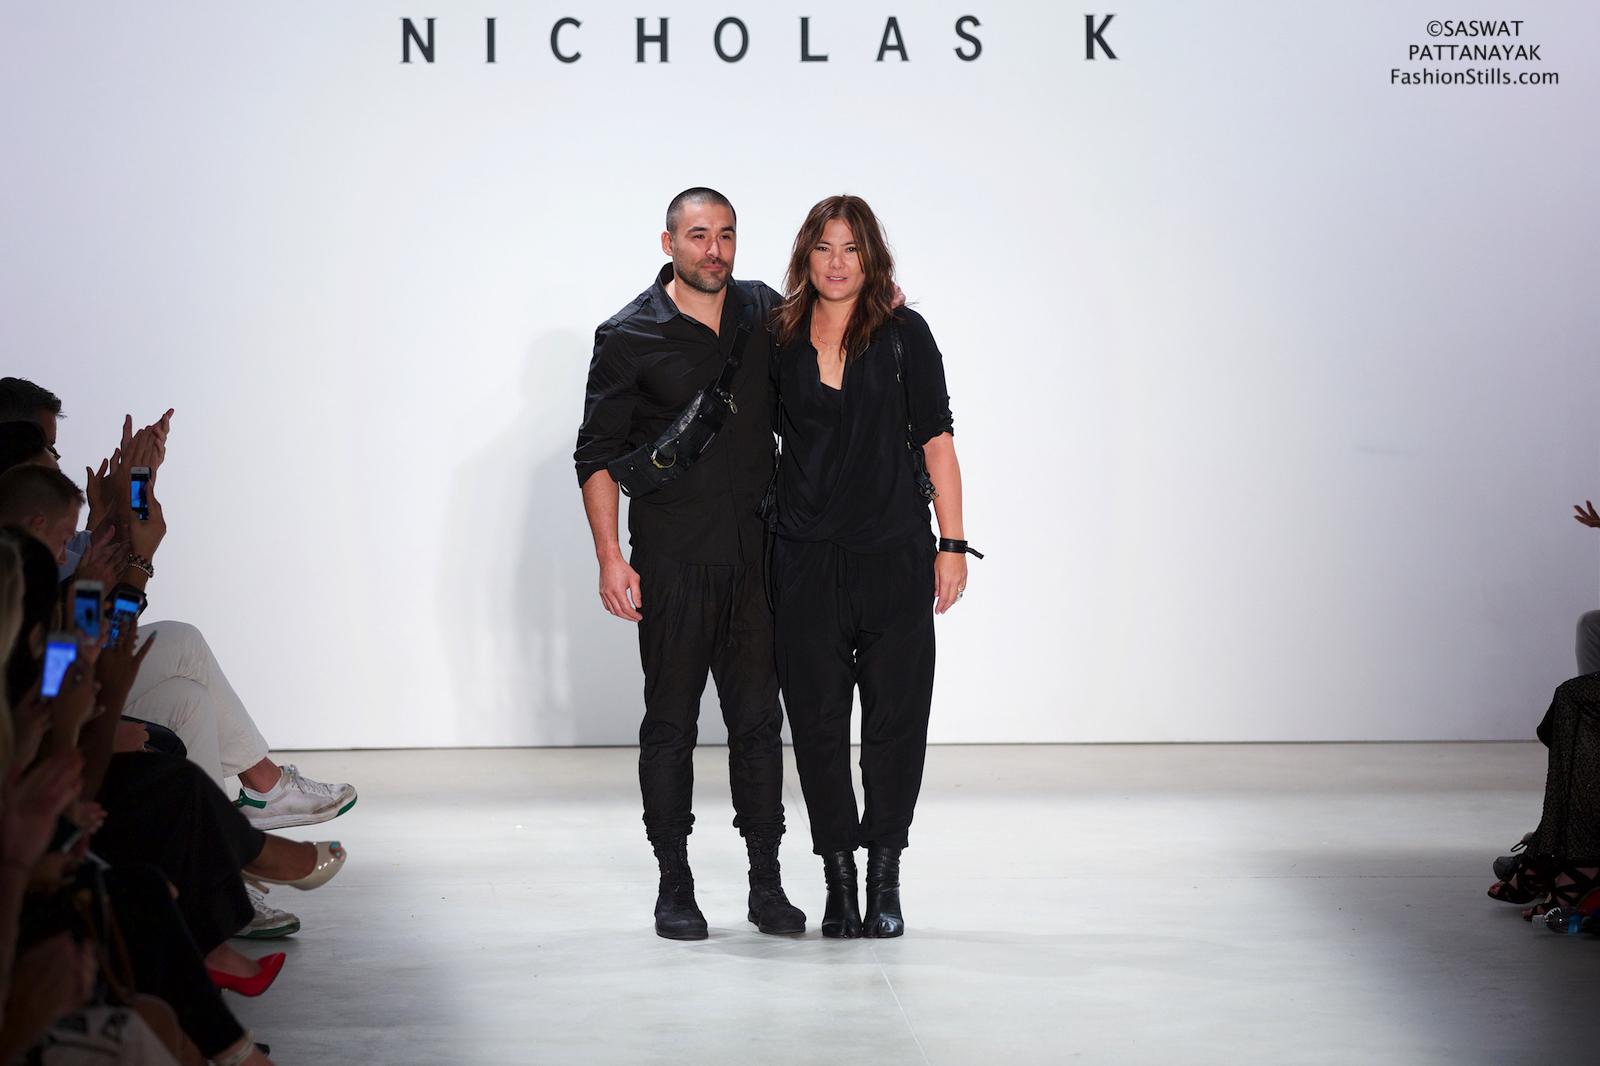 Nicholas-K-Saswat55.jpg